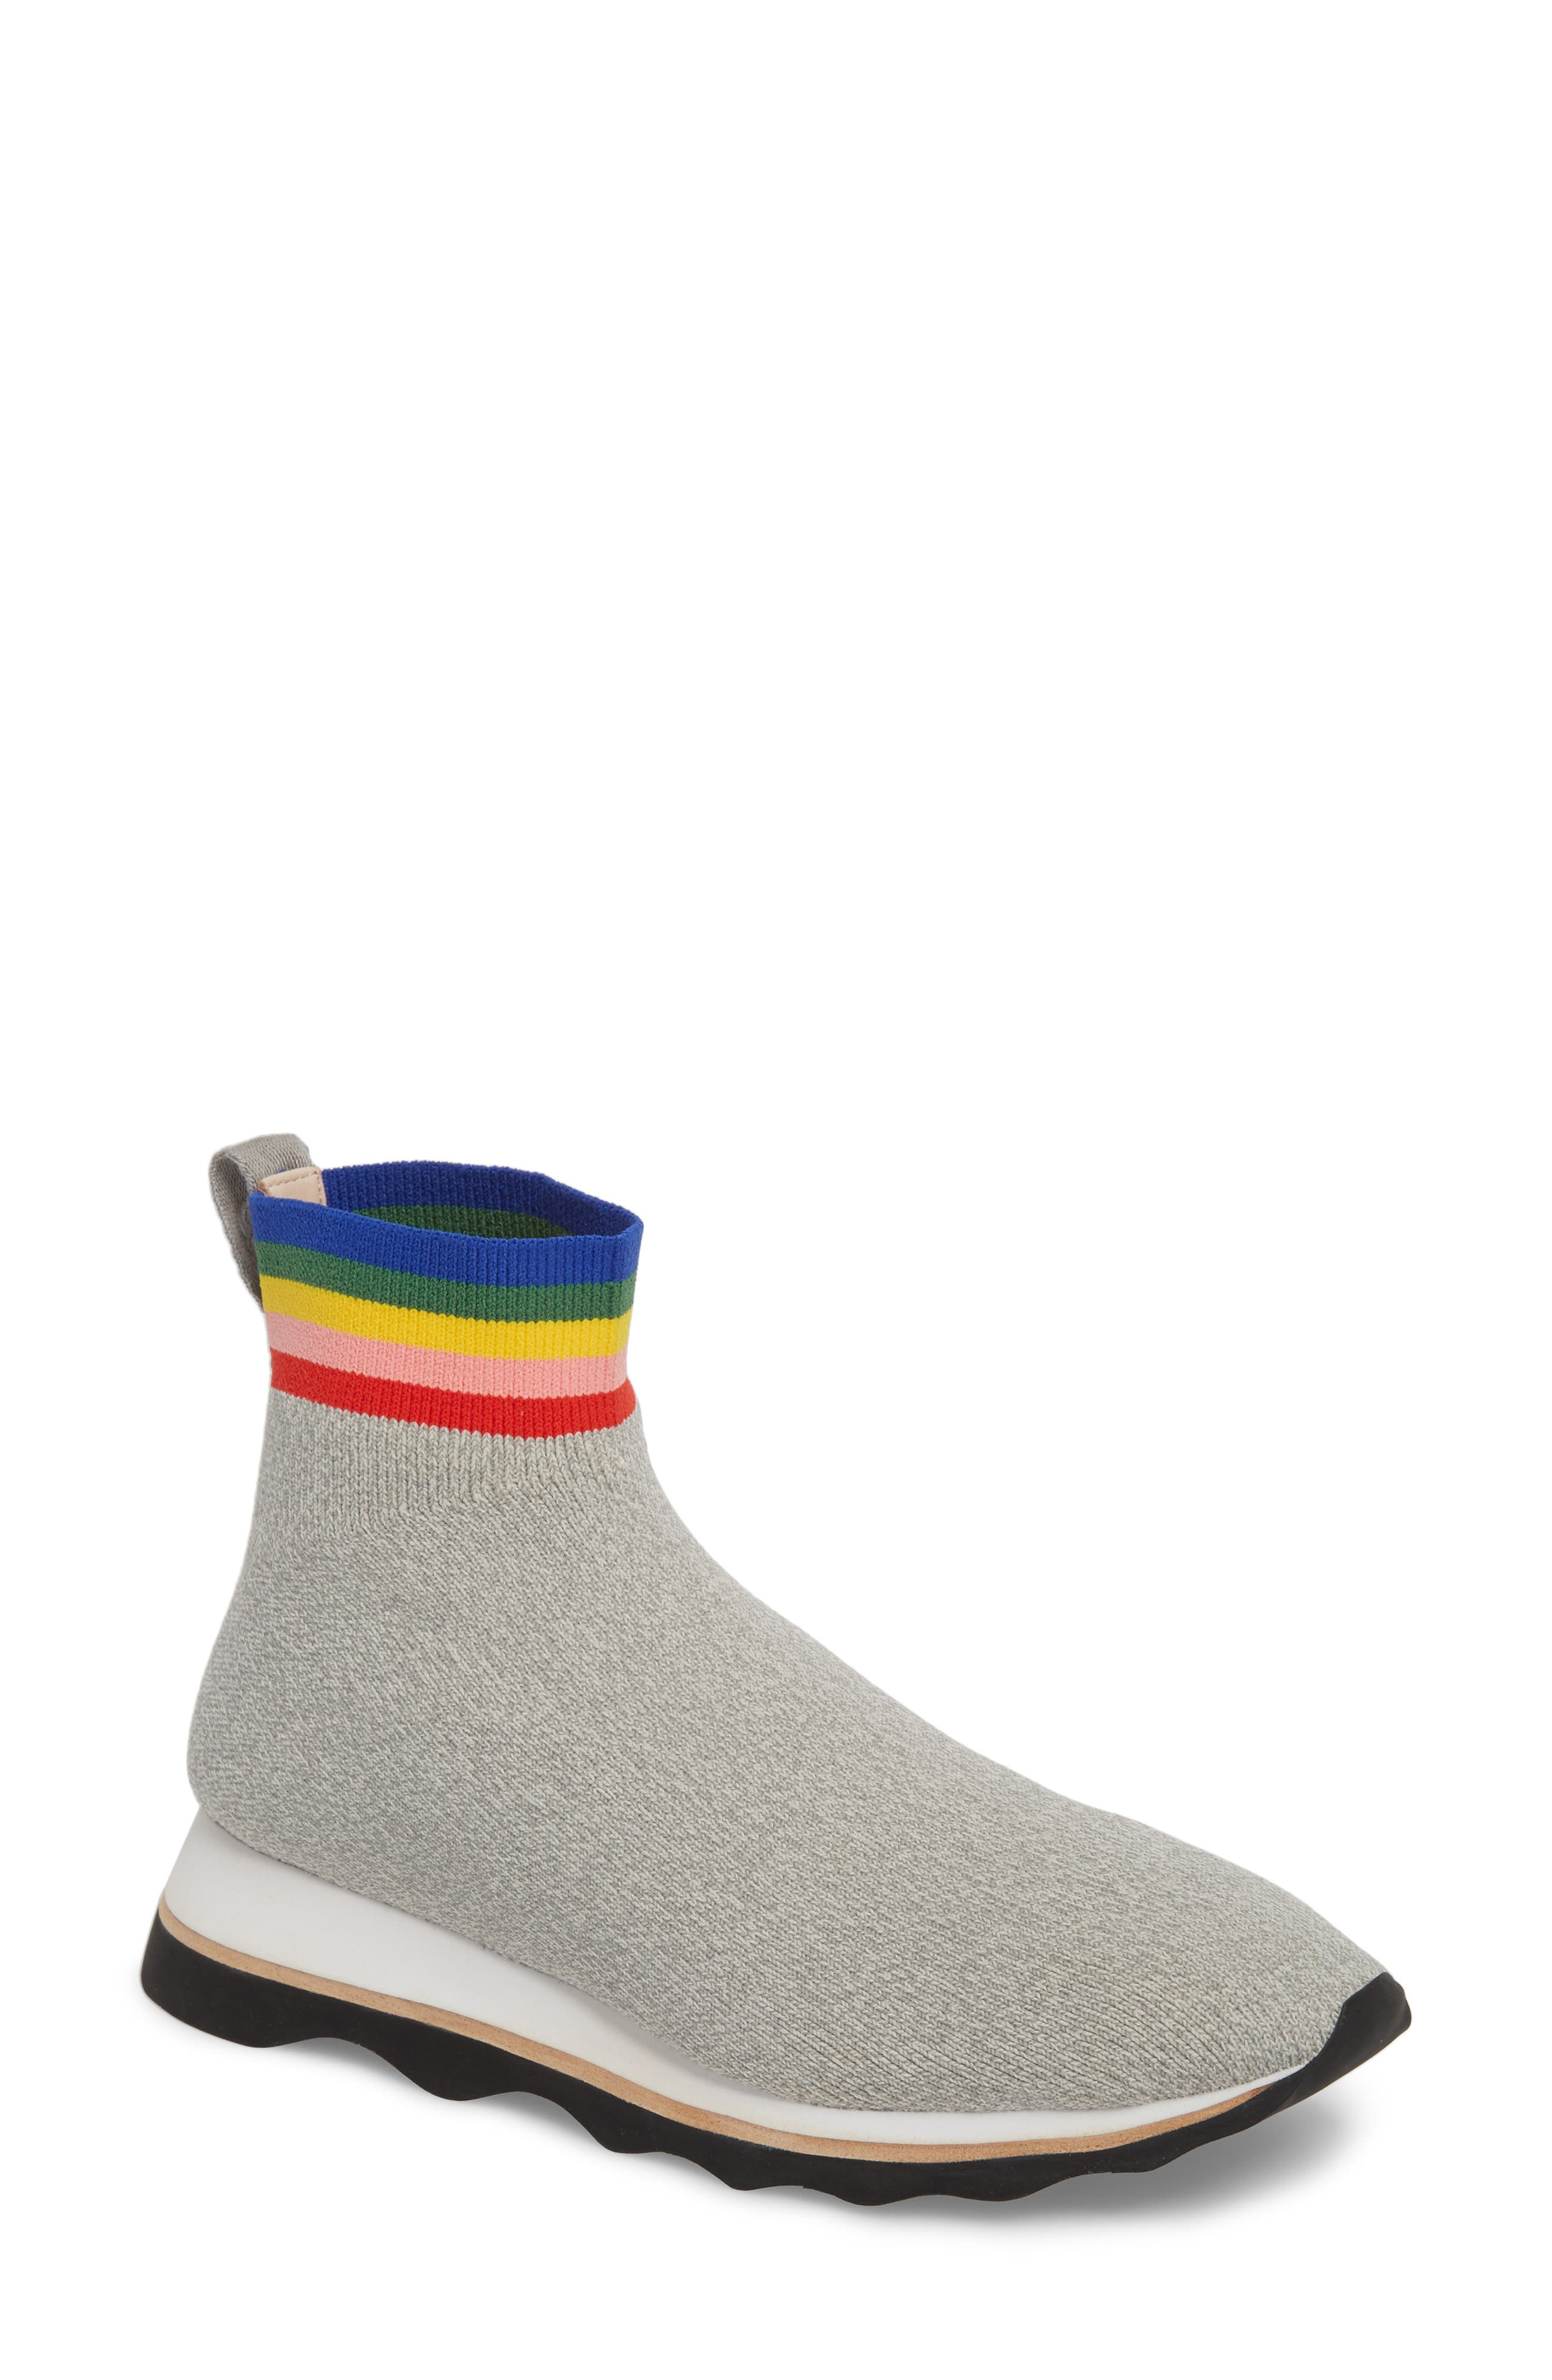 Main Image - Loeffler Randall Scout Sock Sneaker (Women)